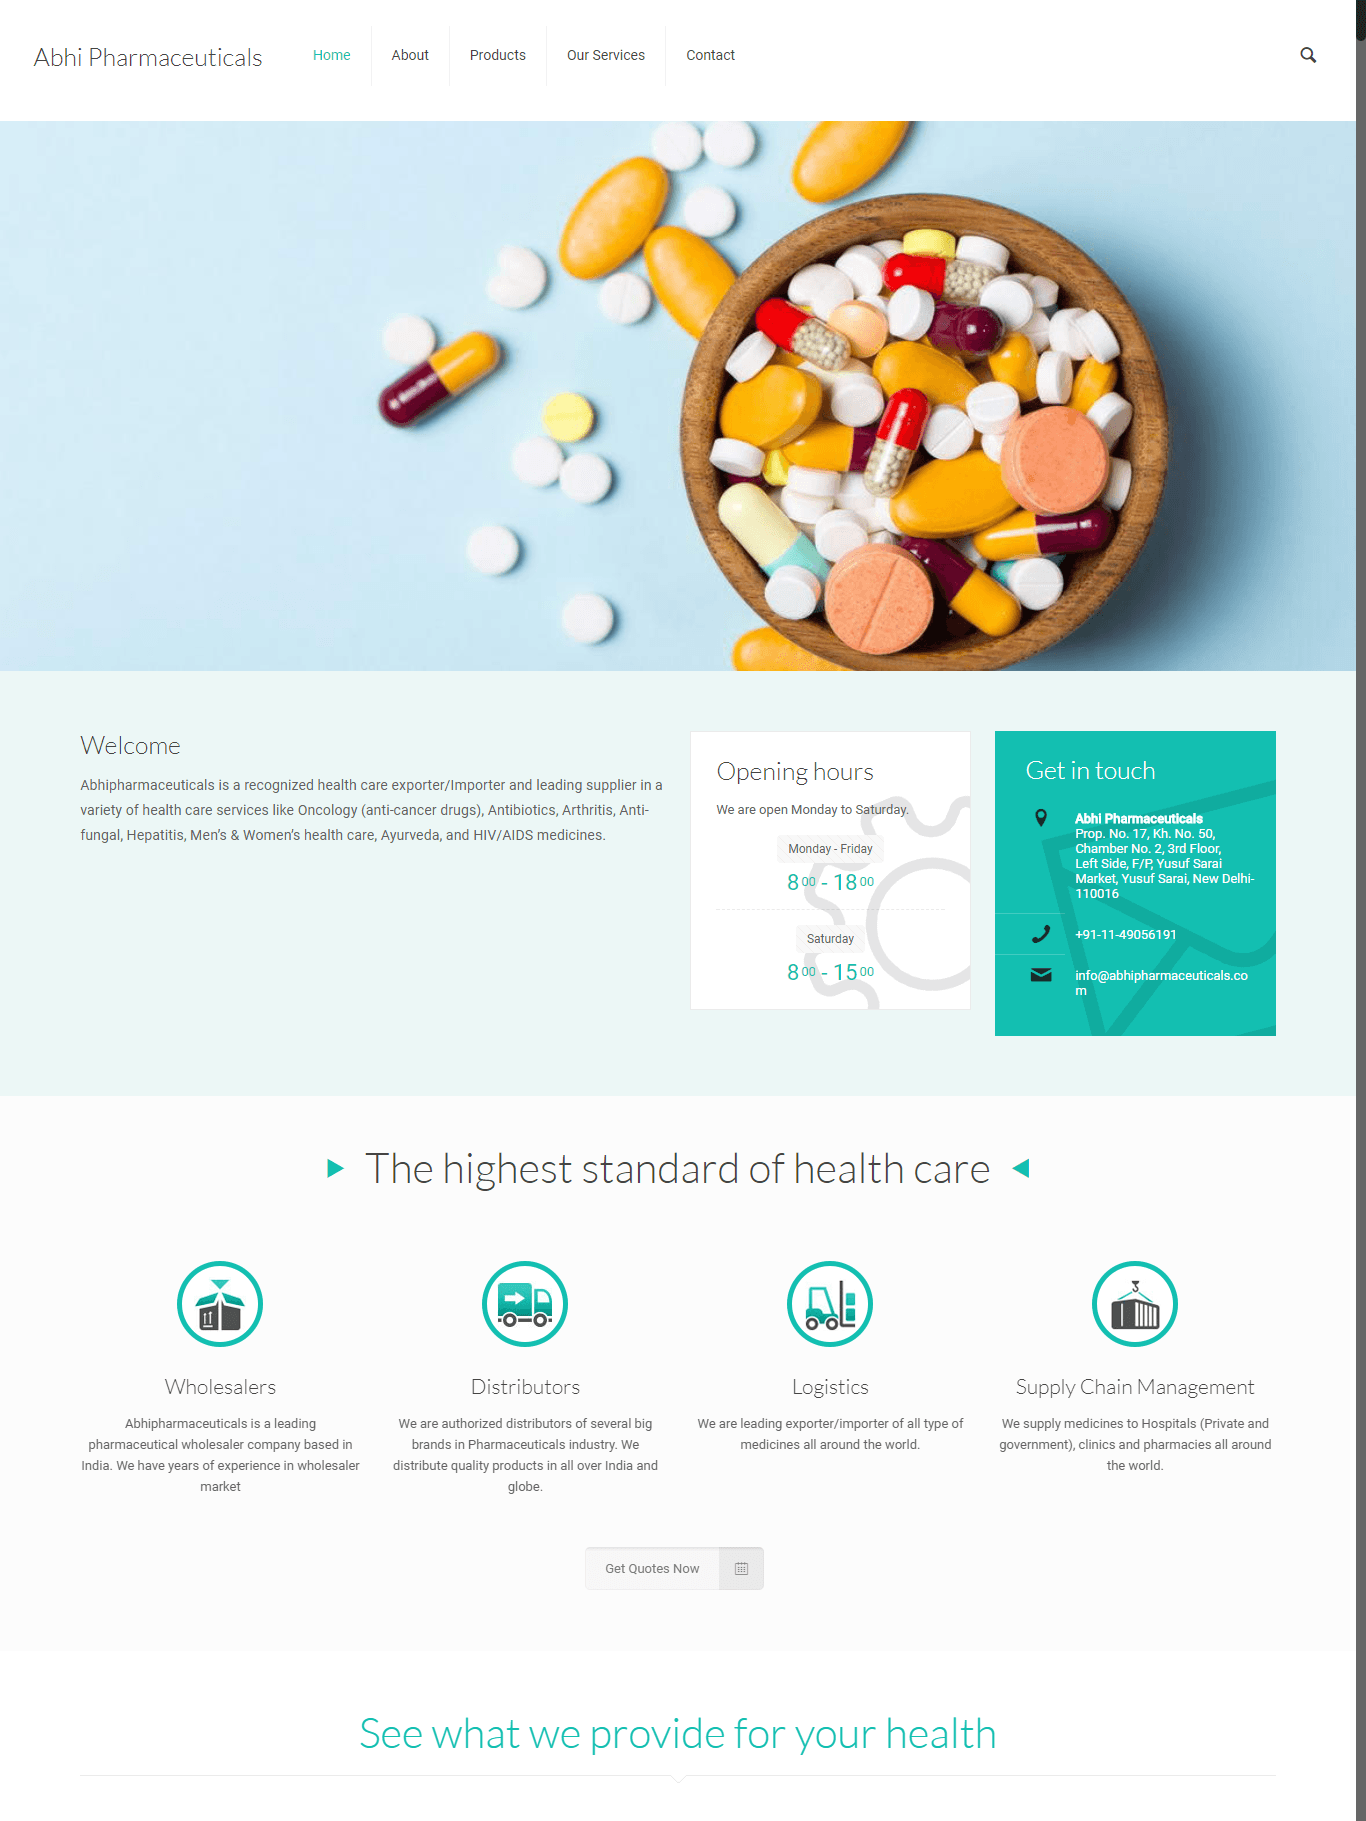 Abhi Pharmaceuticals 1 - Abhi Pharmaceuticals